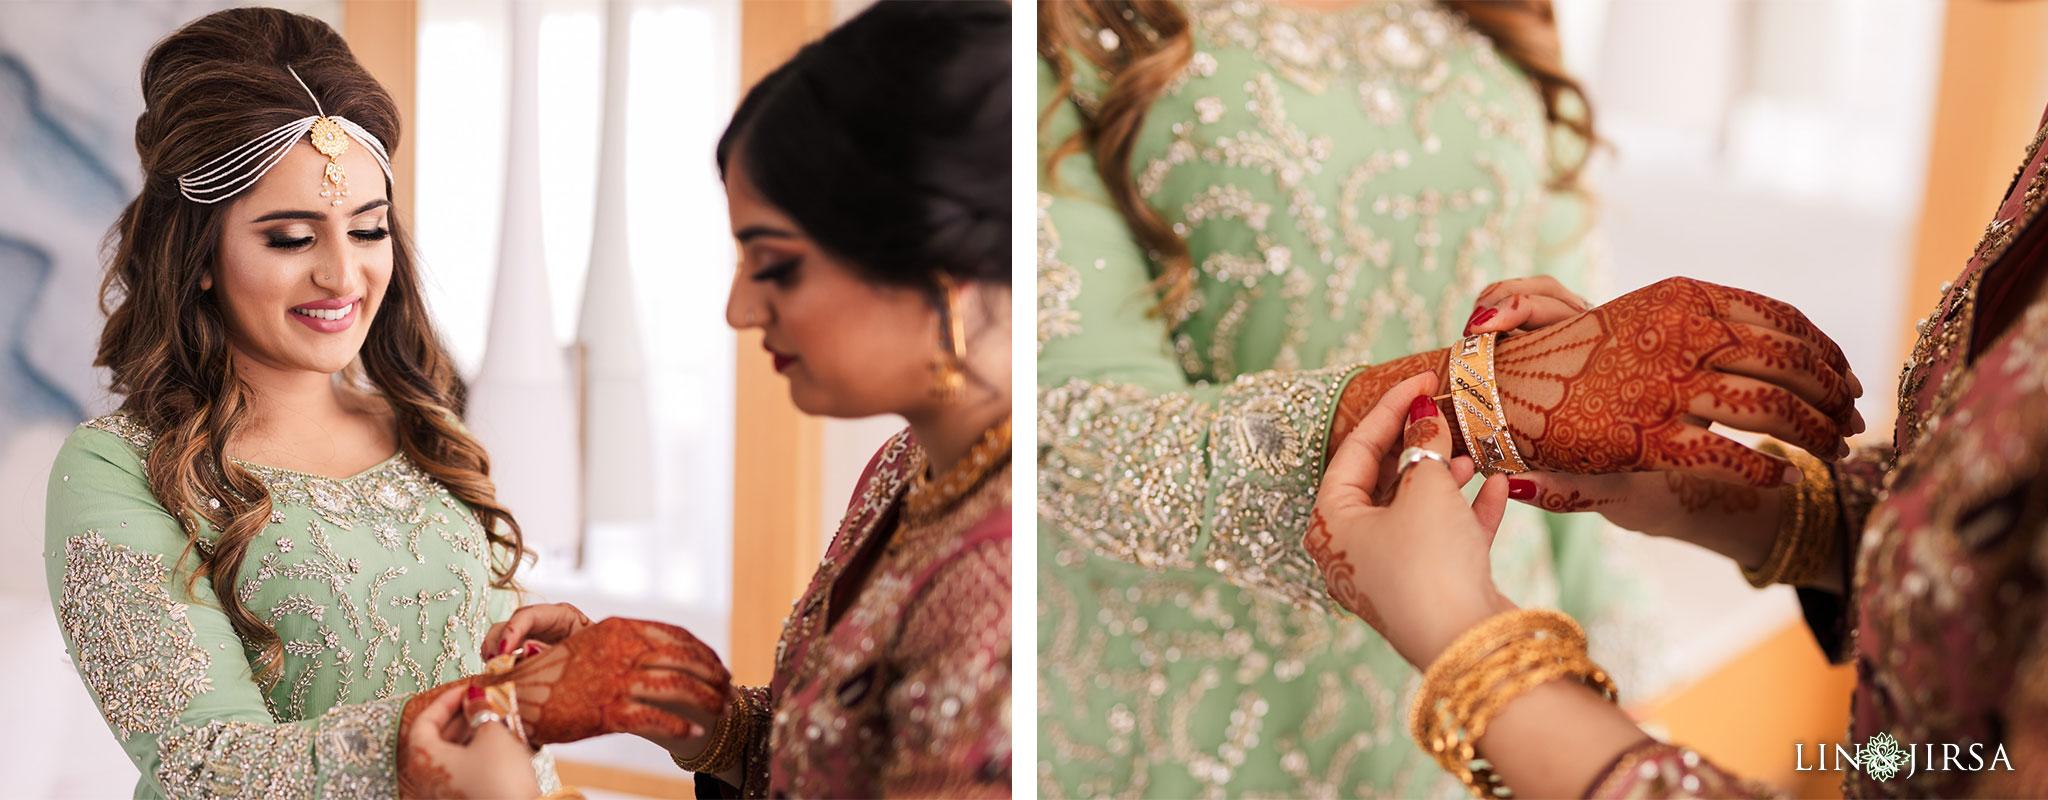 003 pasea hotel huntington beach pakistani muslim wedding photography